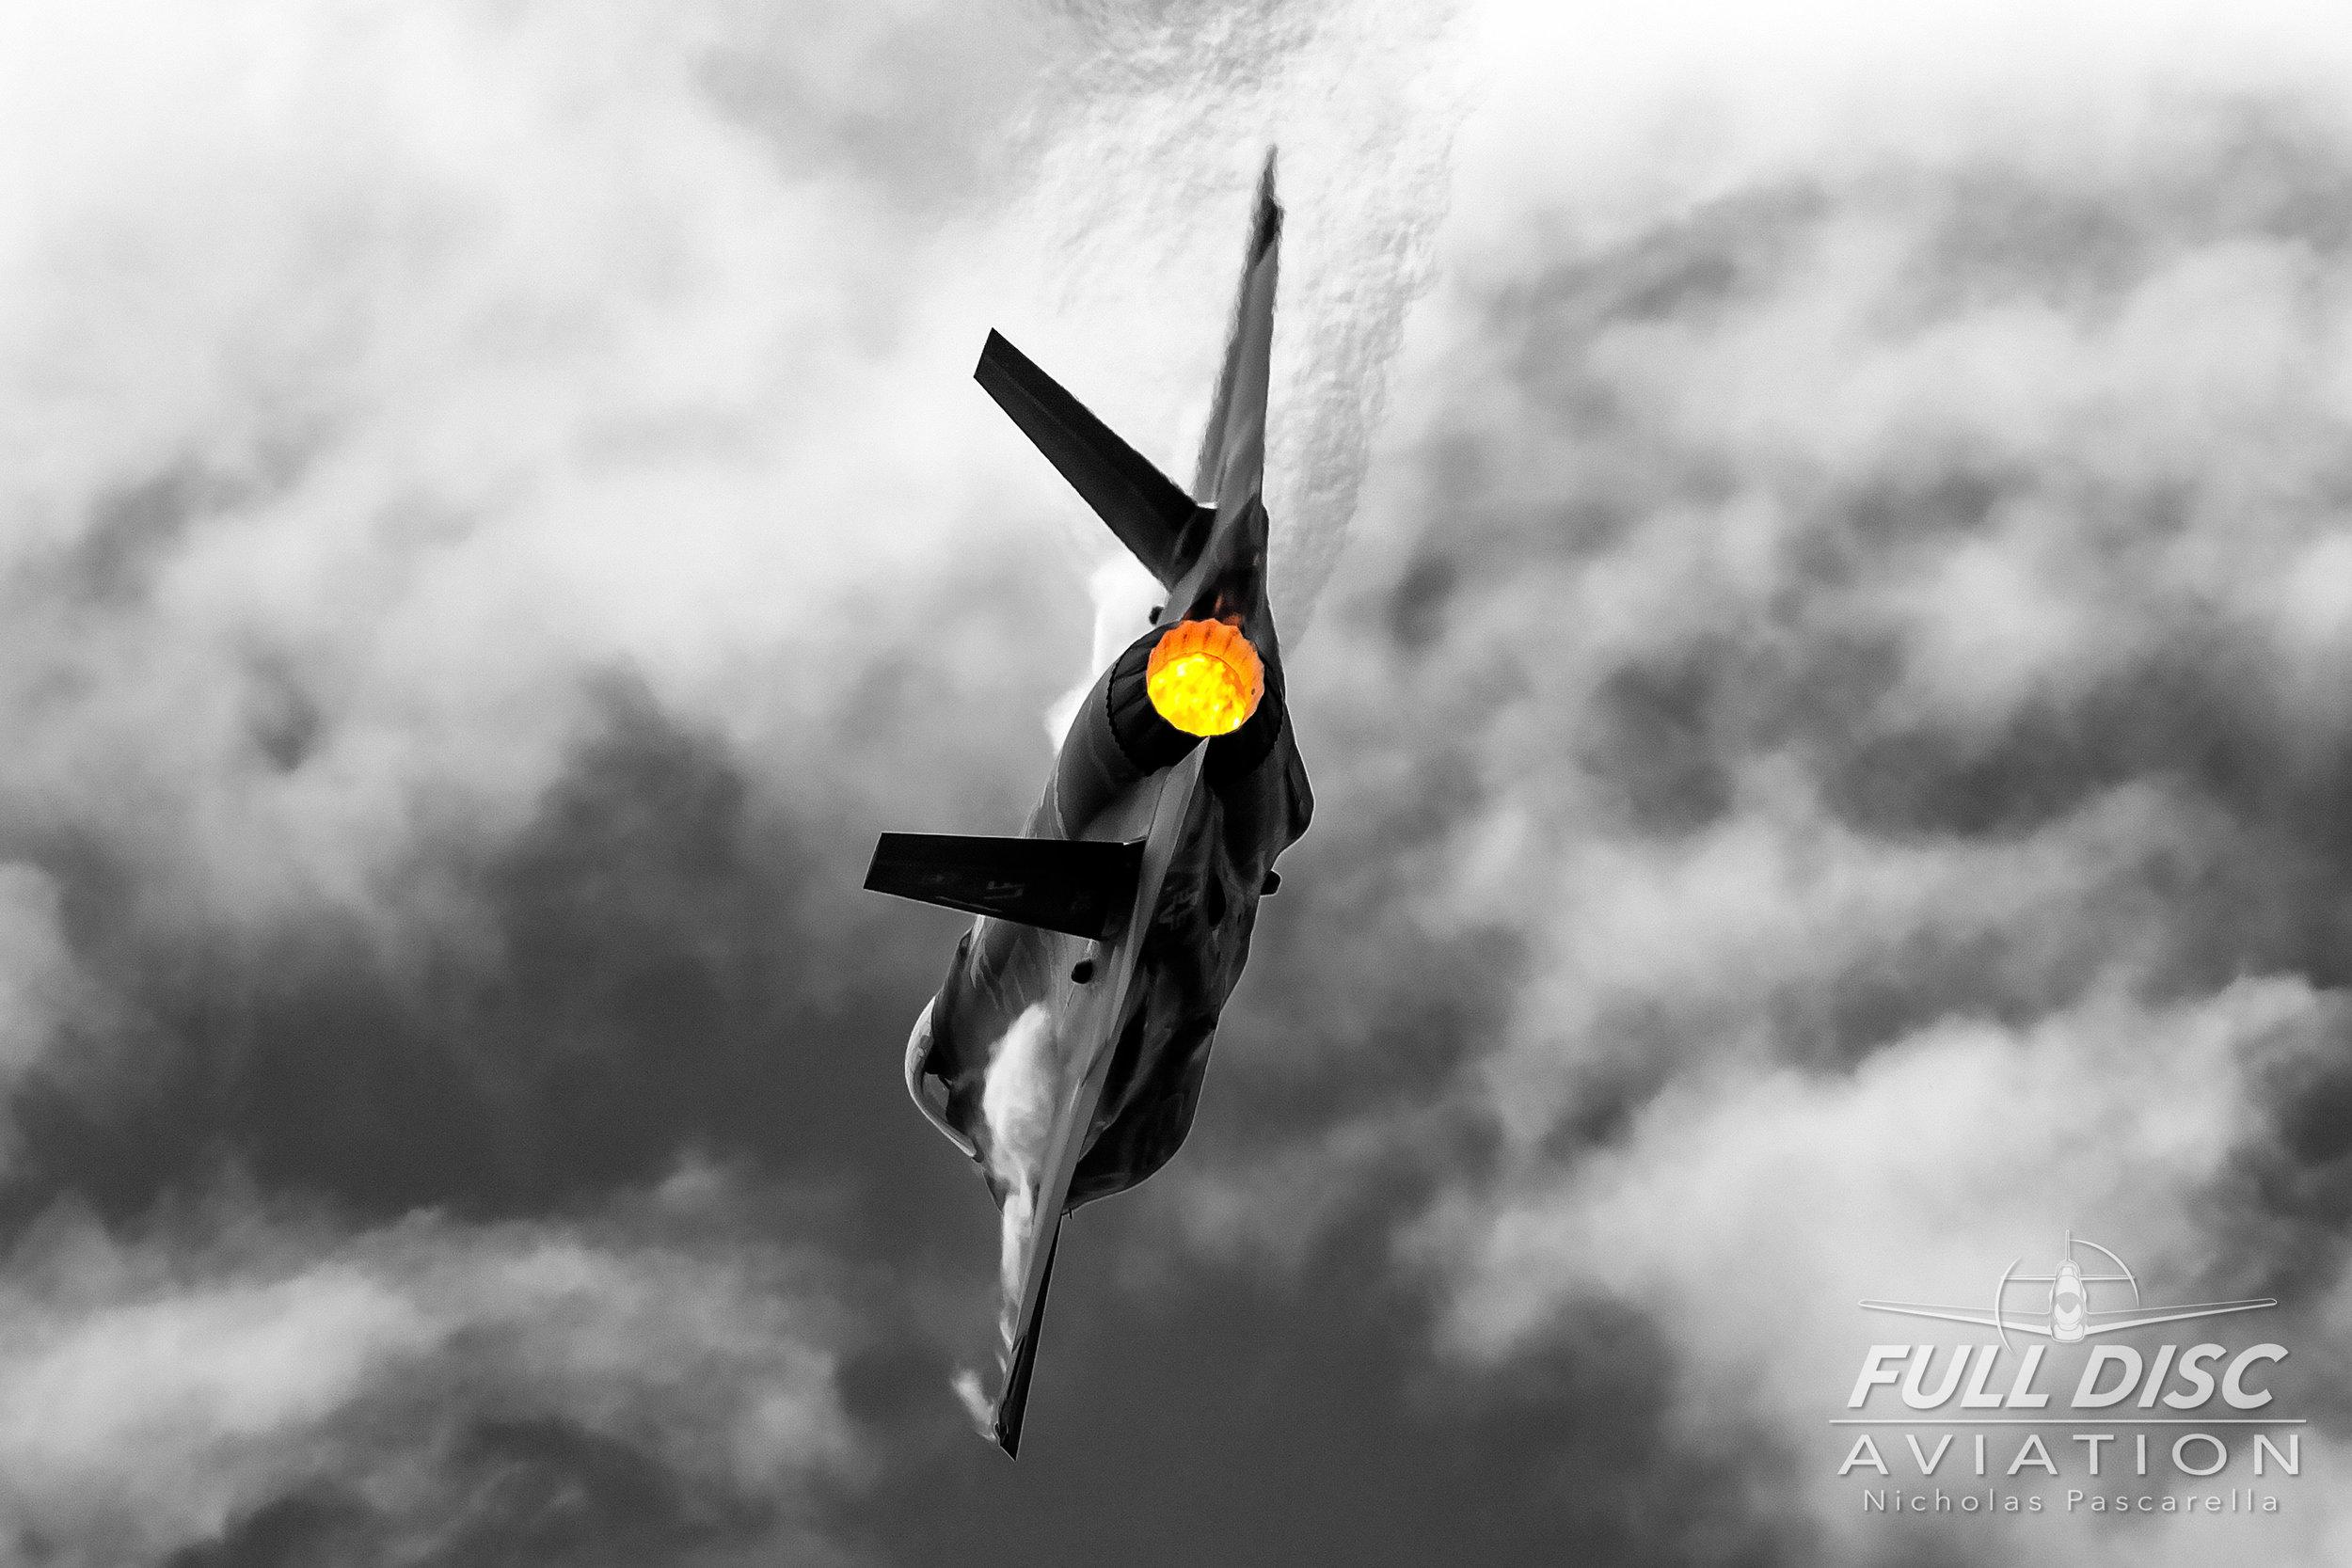 f35_wingsoverwayne_afterburner_fulldiscaviation_nickpascarella.jpg